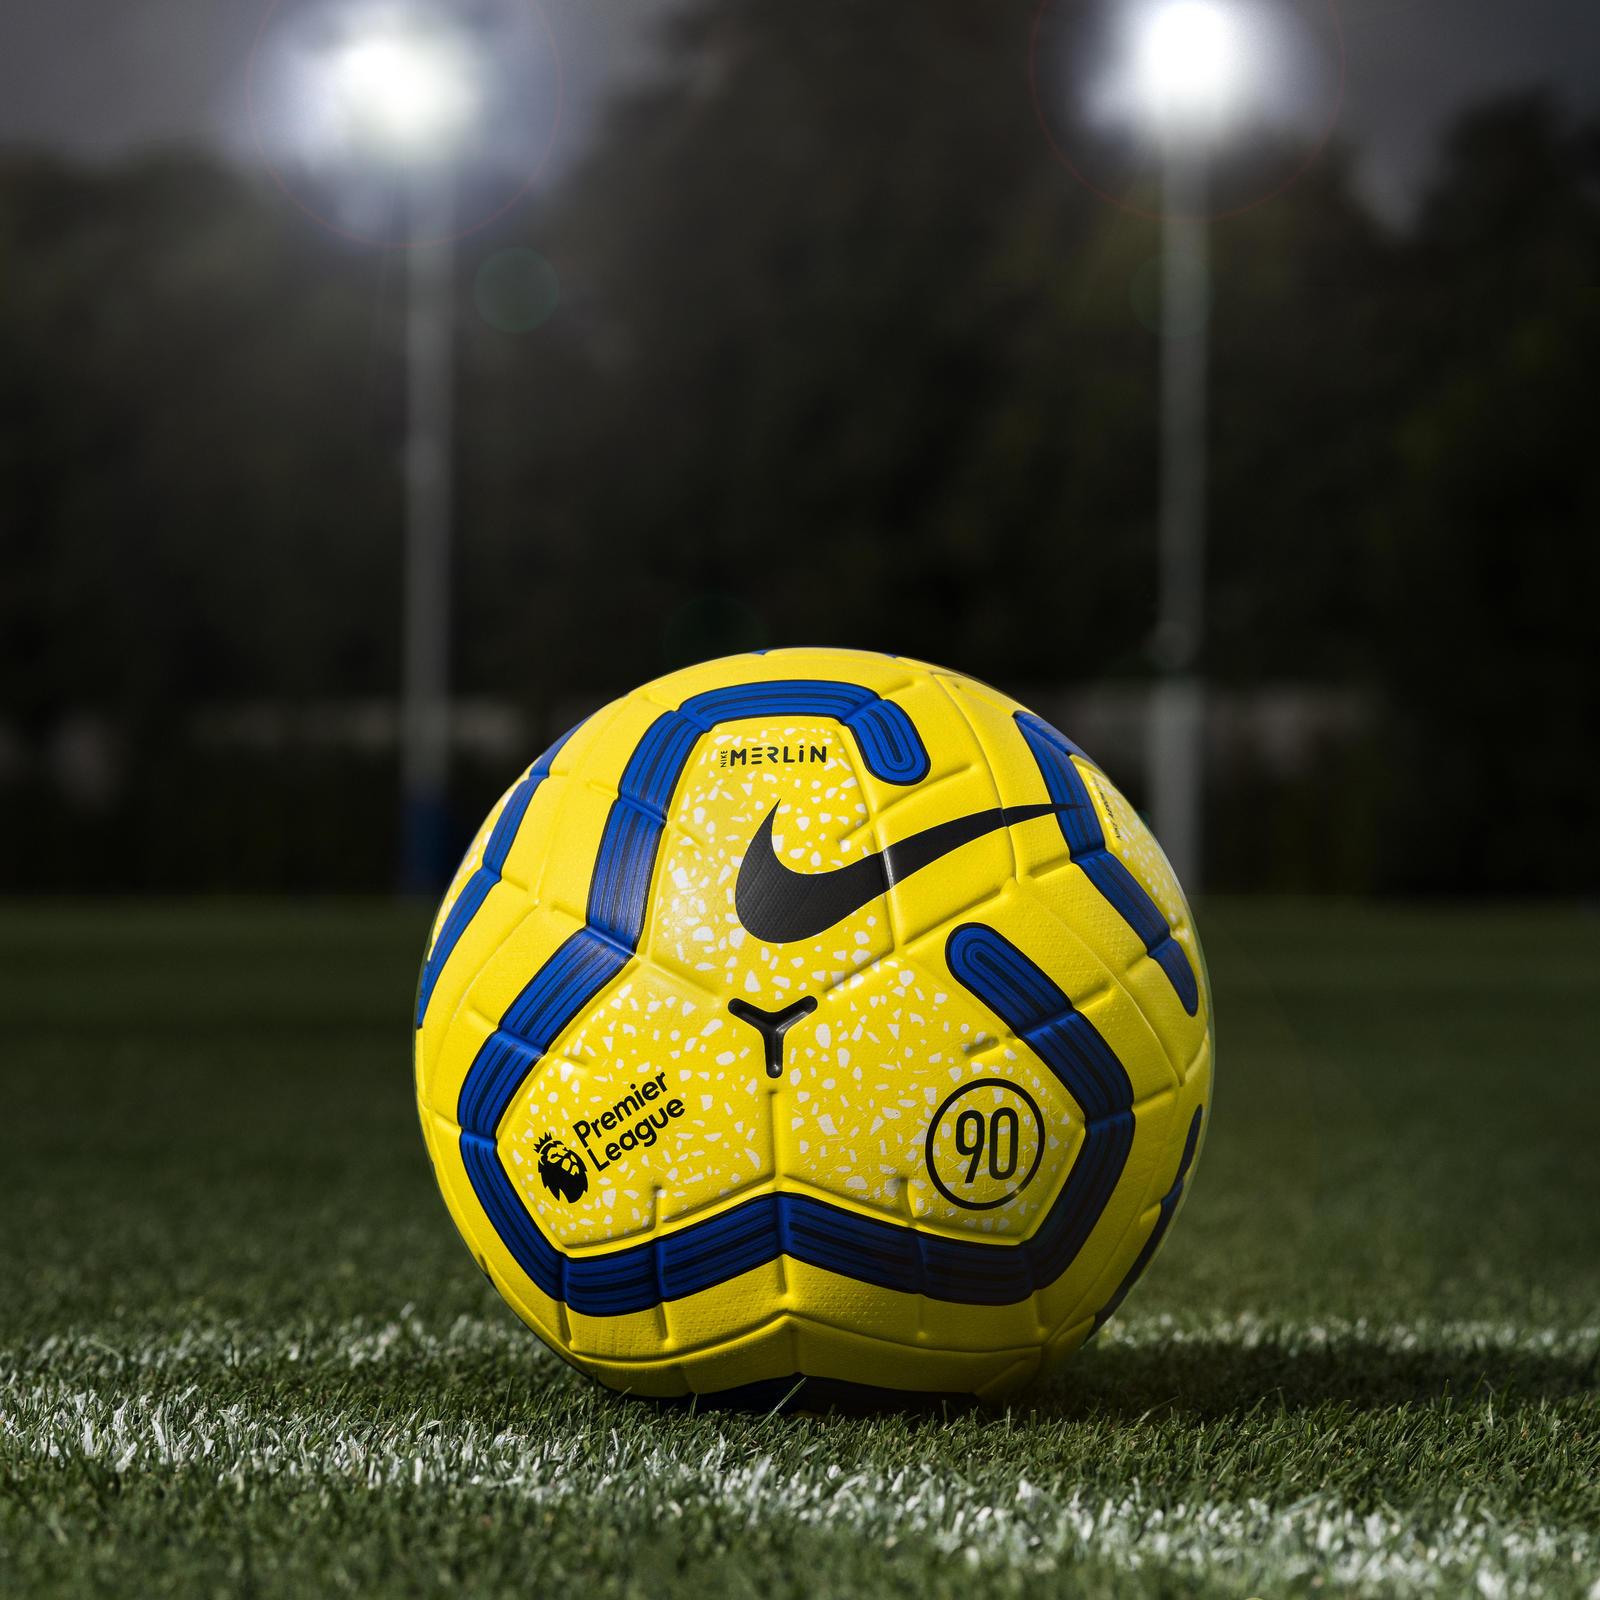 desconcertado Congelar transmitir  Premier League Nike Hi-Vis Merlin Match Ball 2019-20 - Nike News